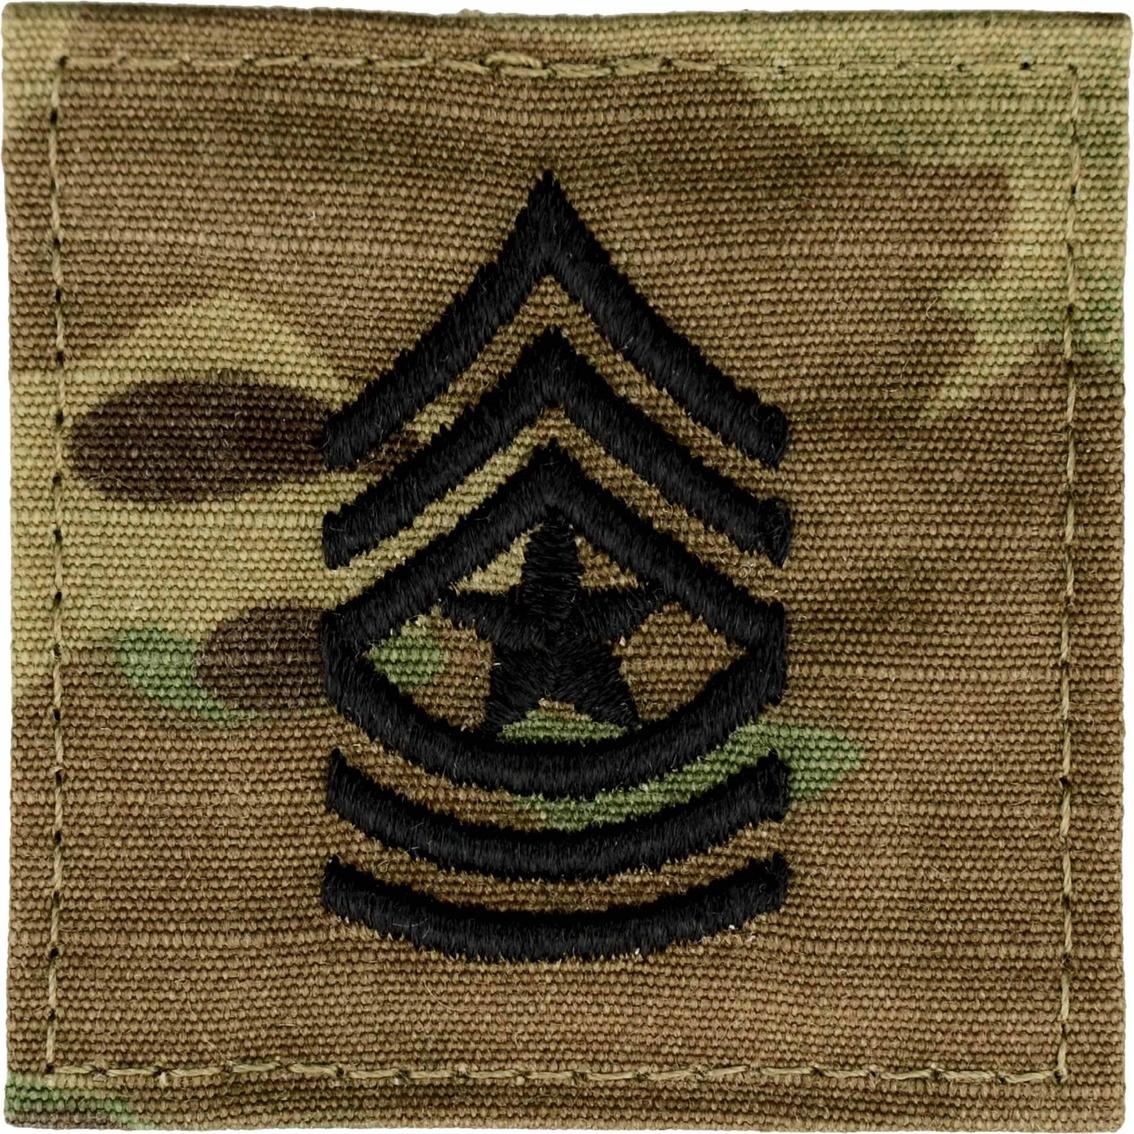 Army (Multicam) Sew On Rank SGM (E9) - Patriot Surplus